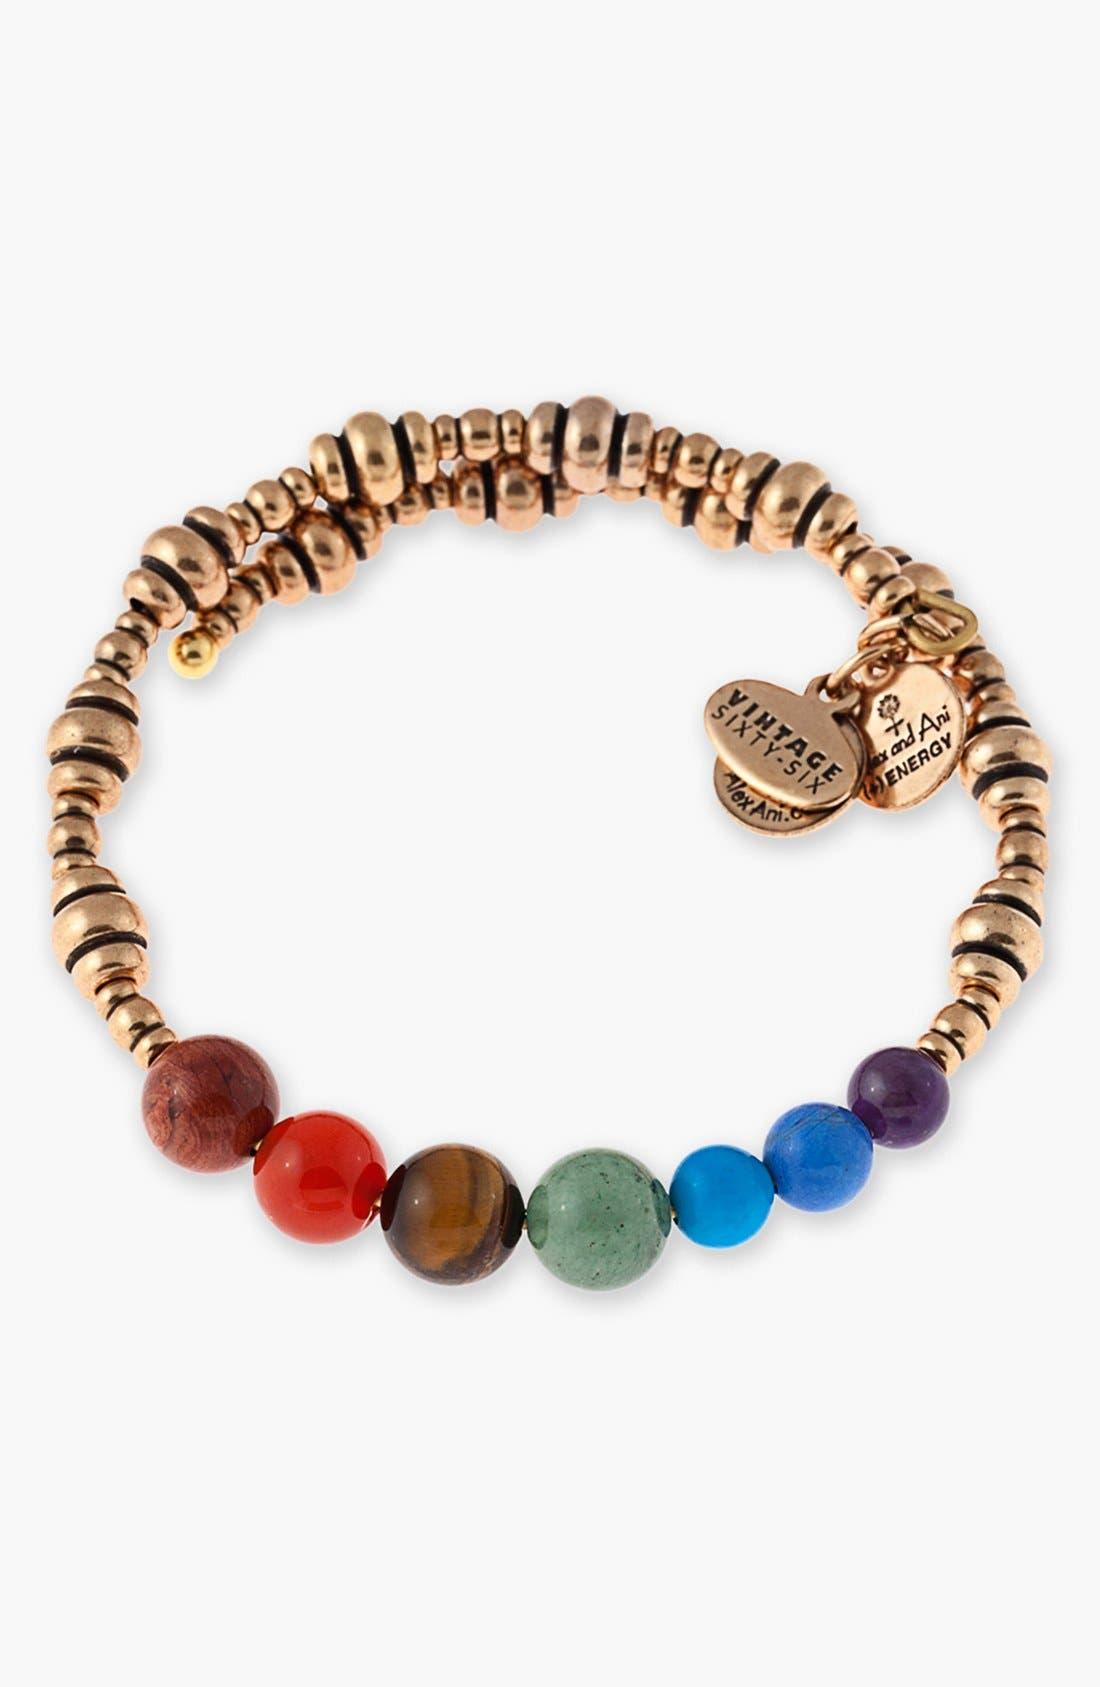 Alternate Image 1 Selected - Alex and Ani 'Journey' Wrap Bracelet